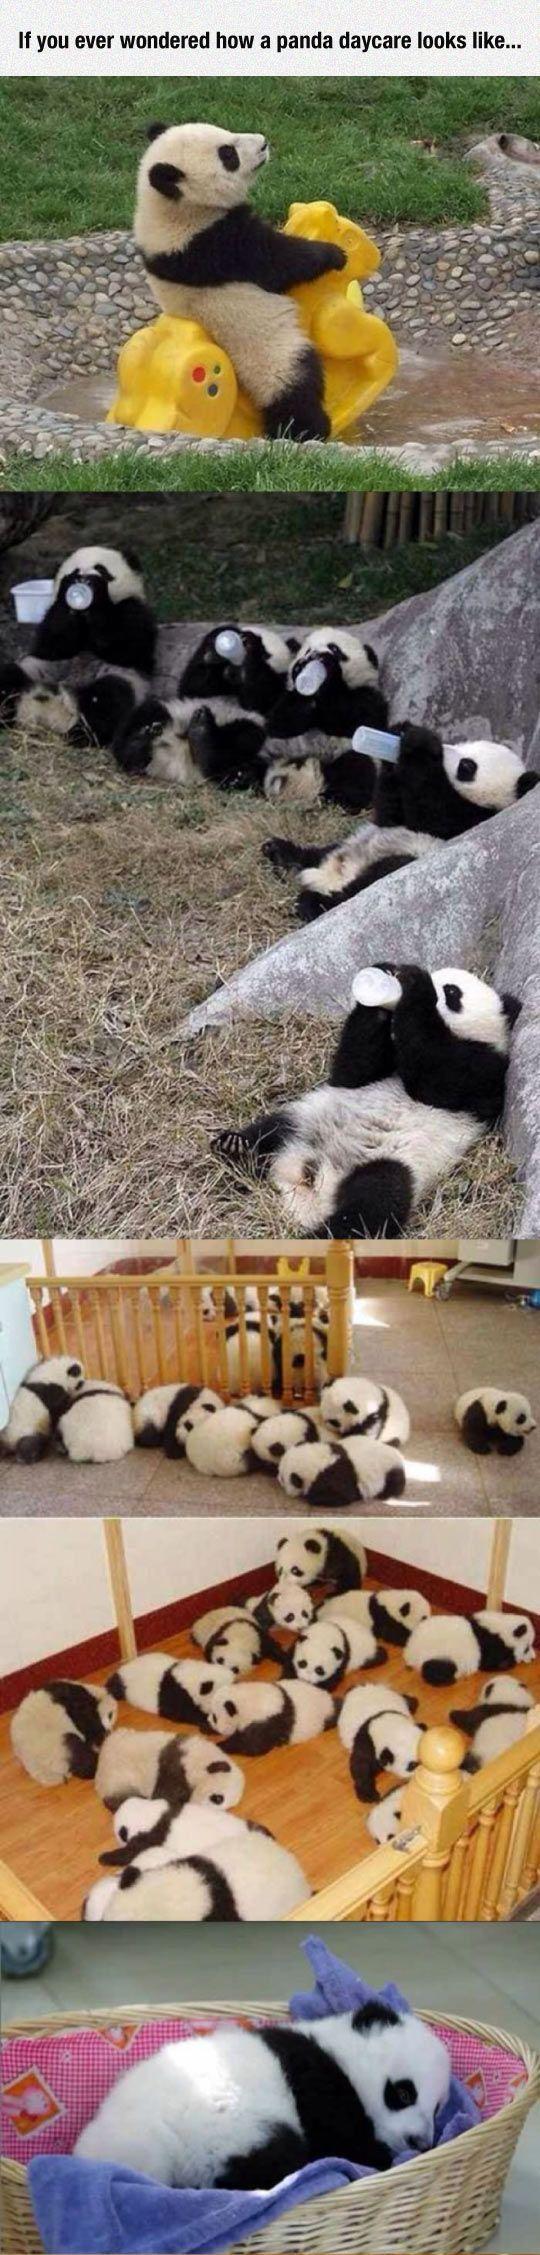 Panda Daycare.....we're speechless!